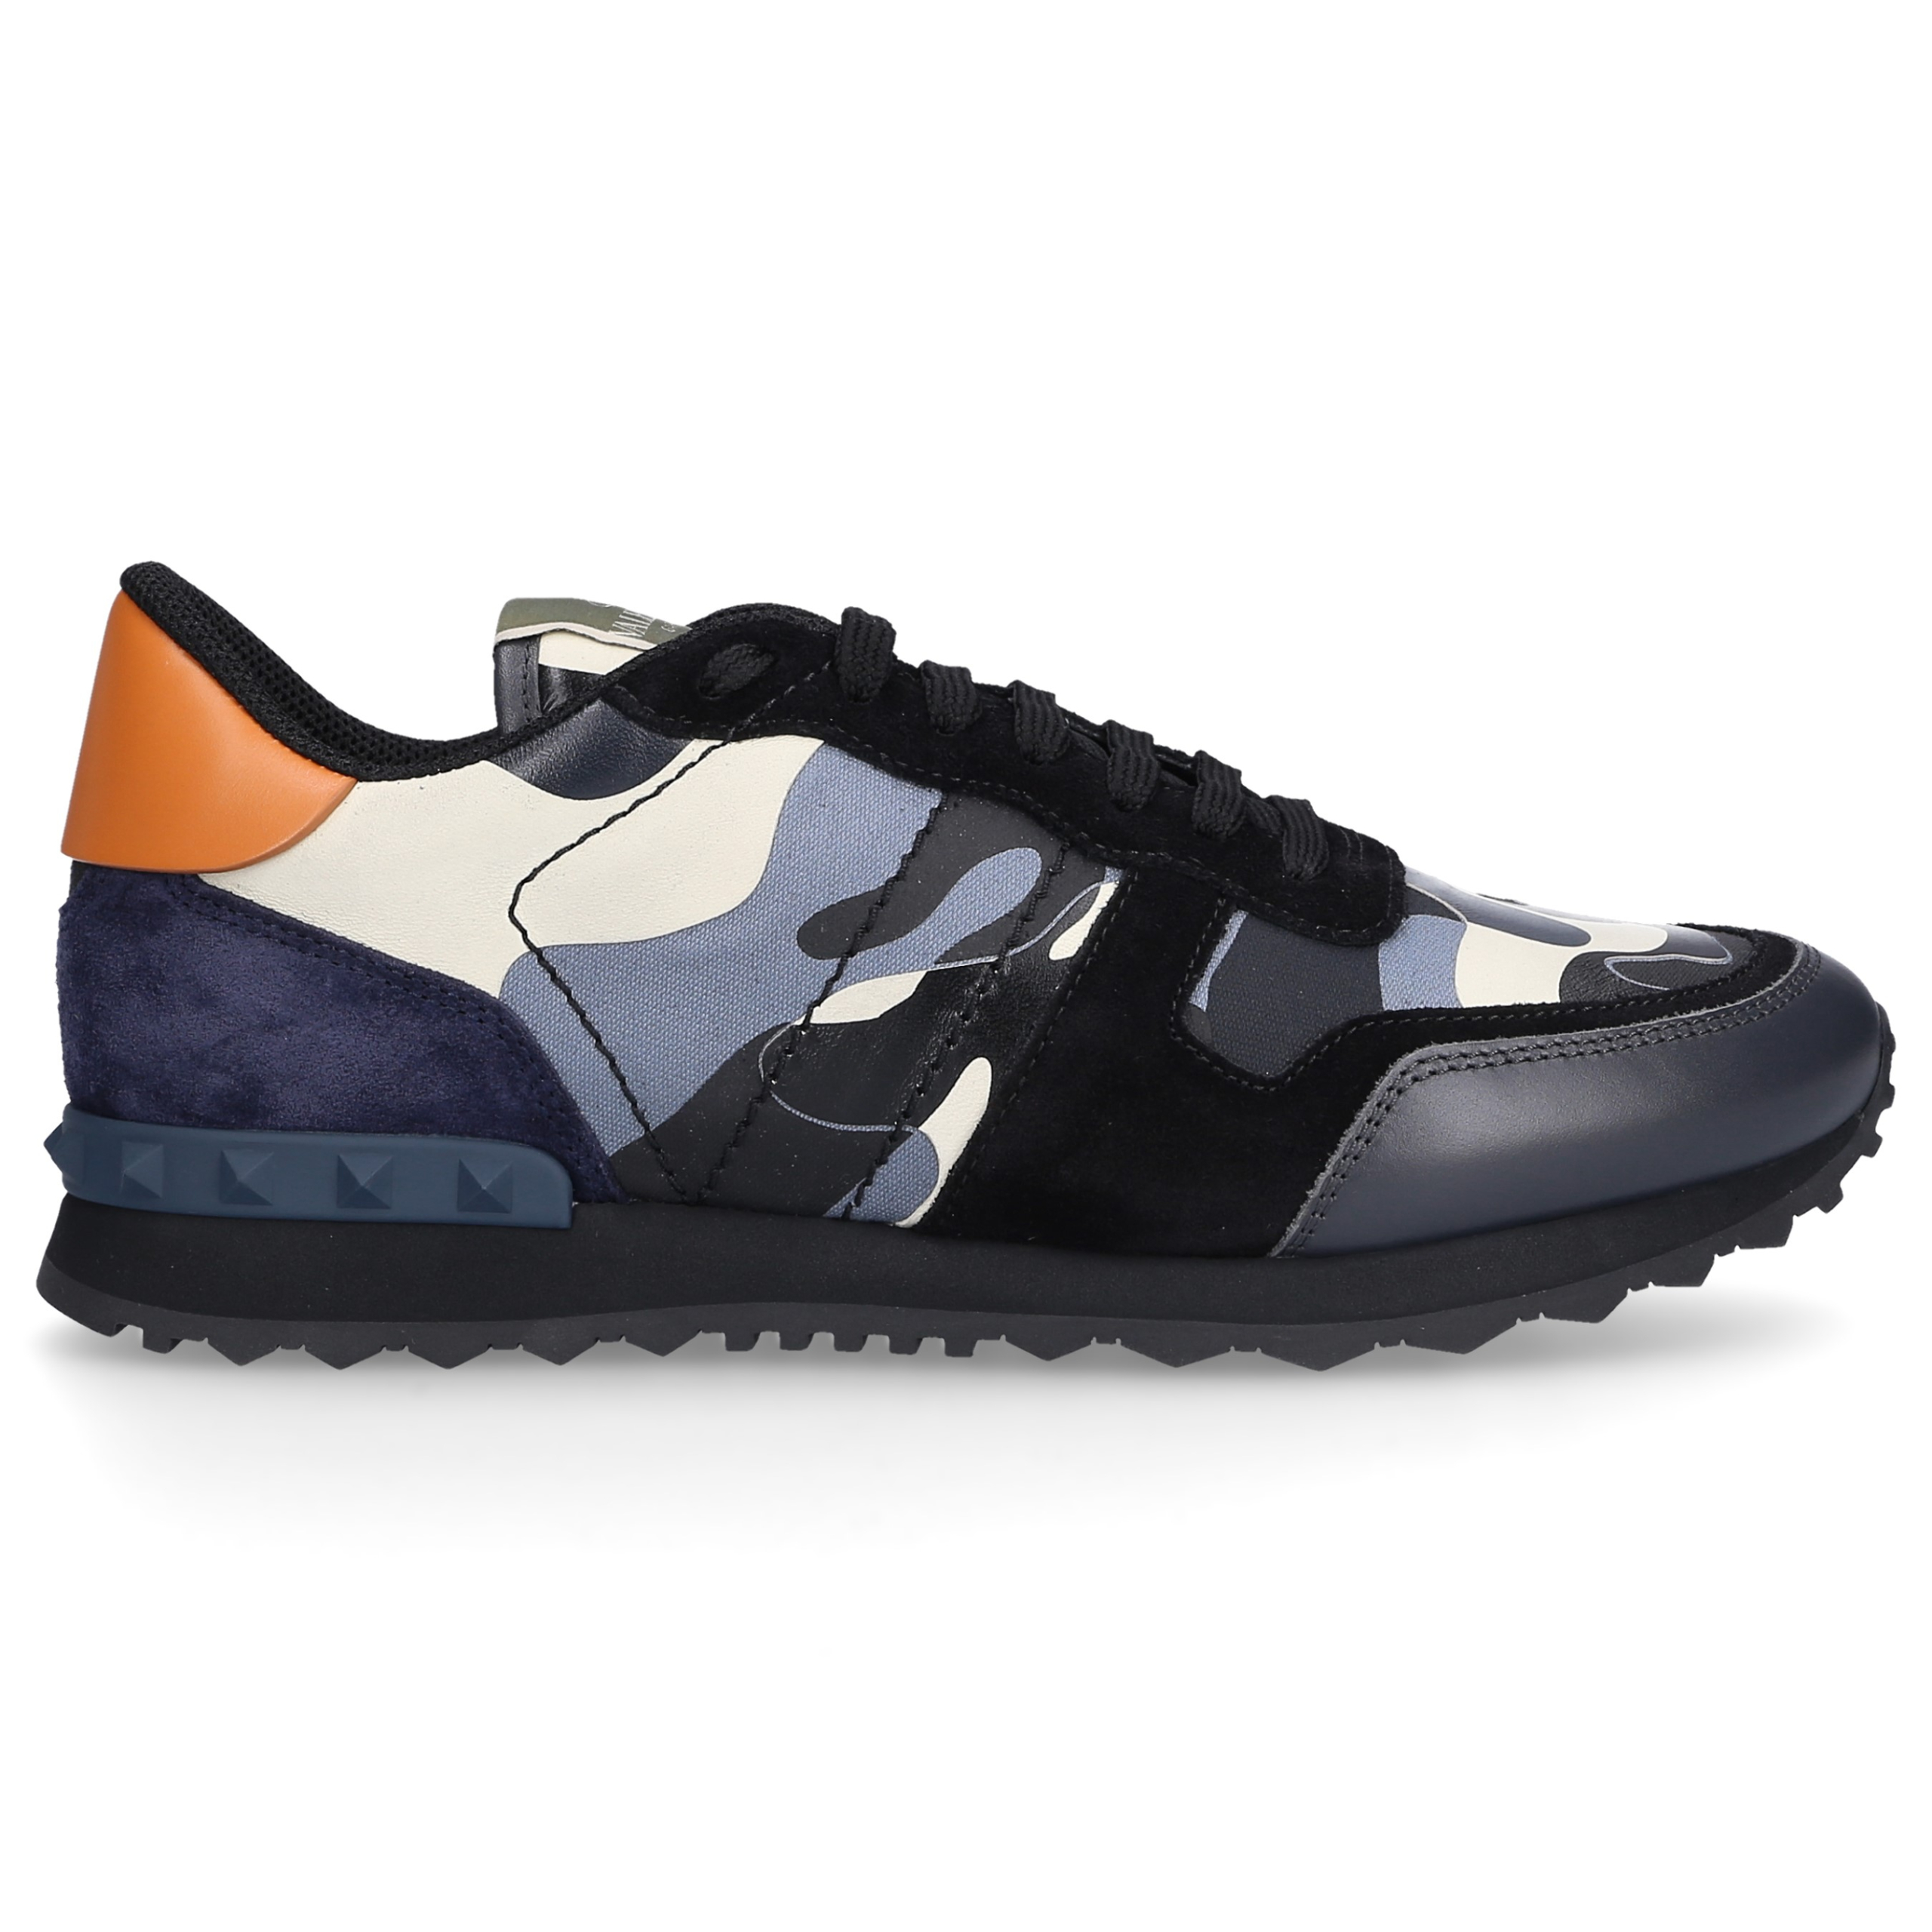 Sneaker low ROCKRUNNER Kalbsleder Materialmix Logo blau schwarz